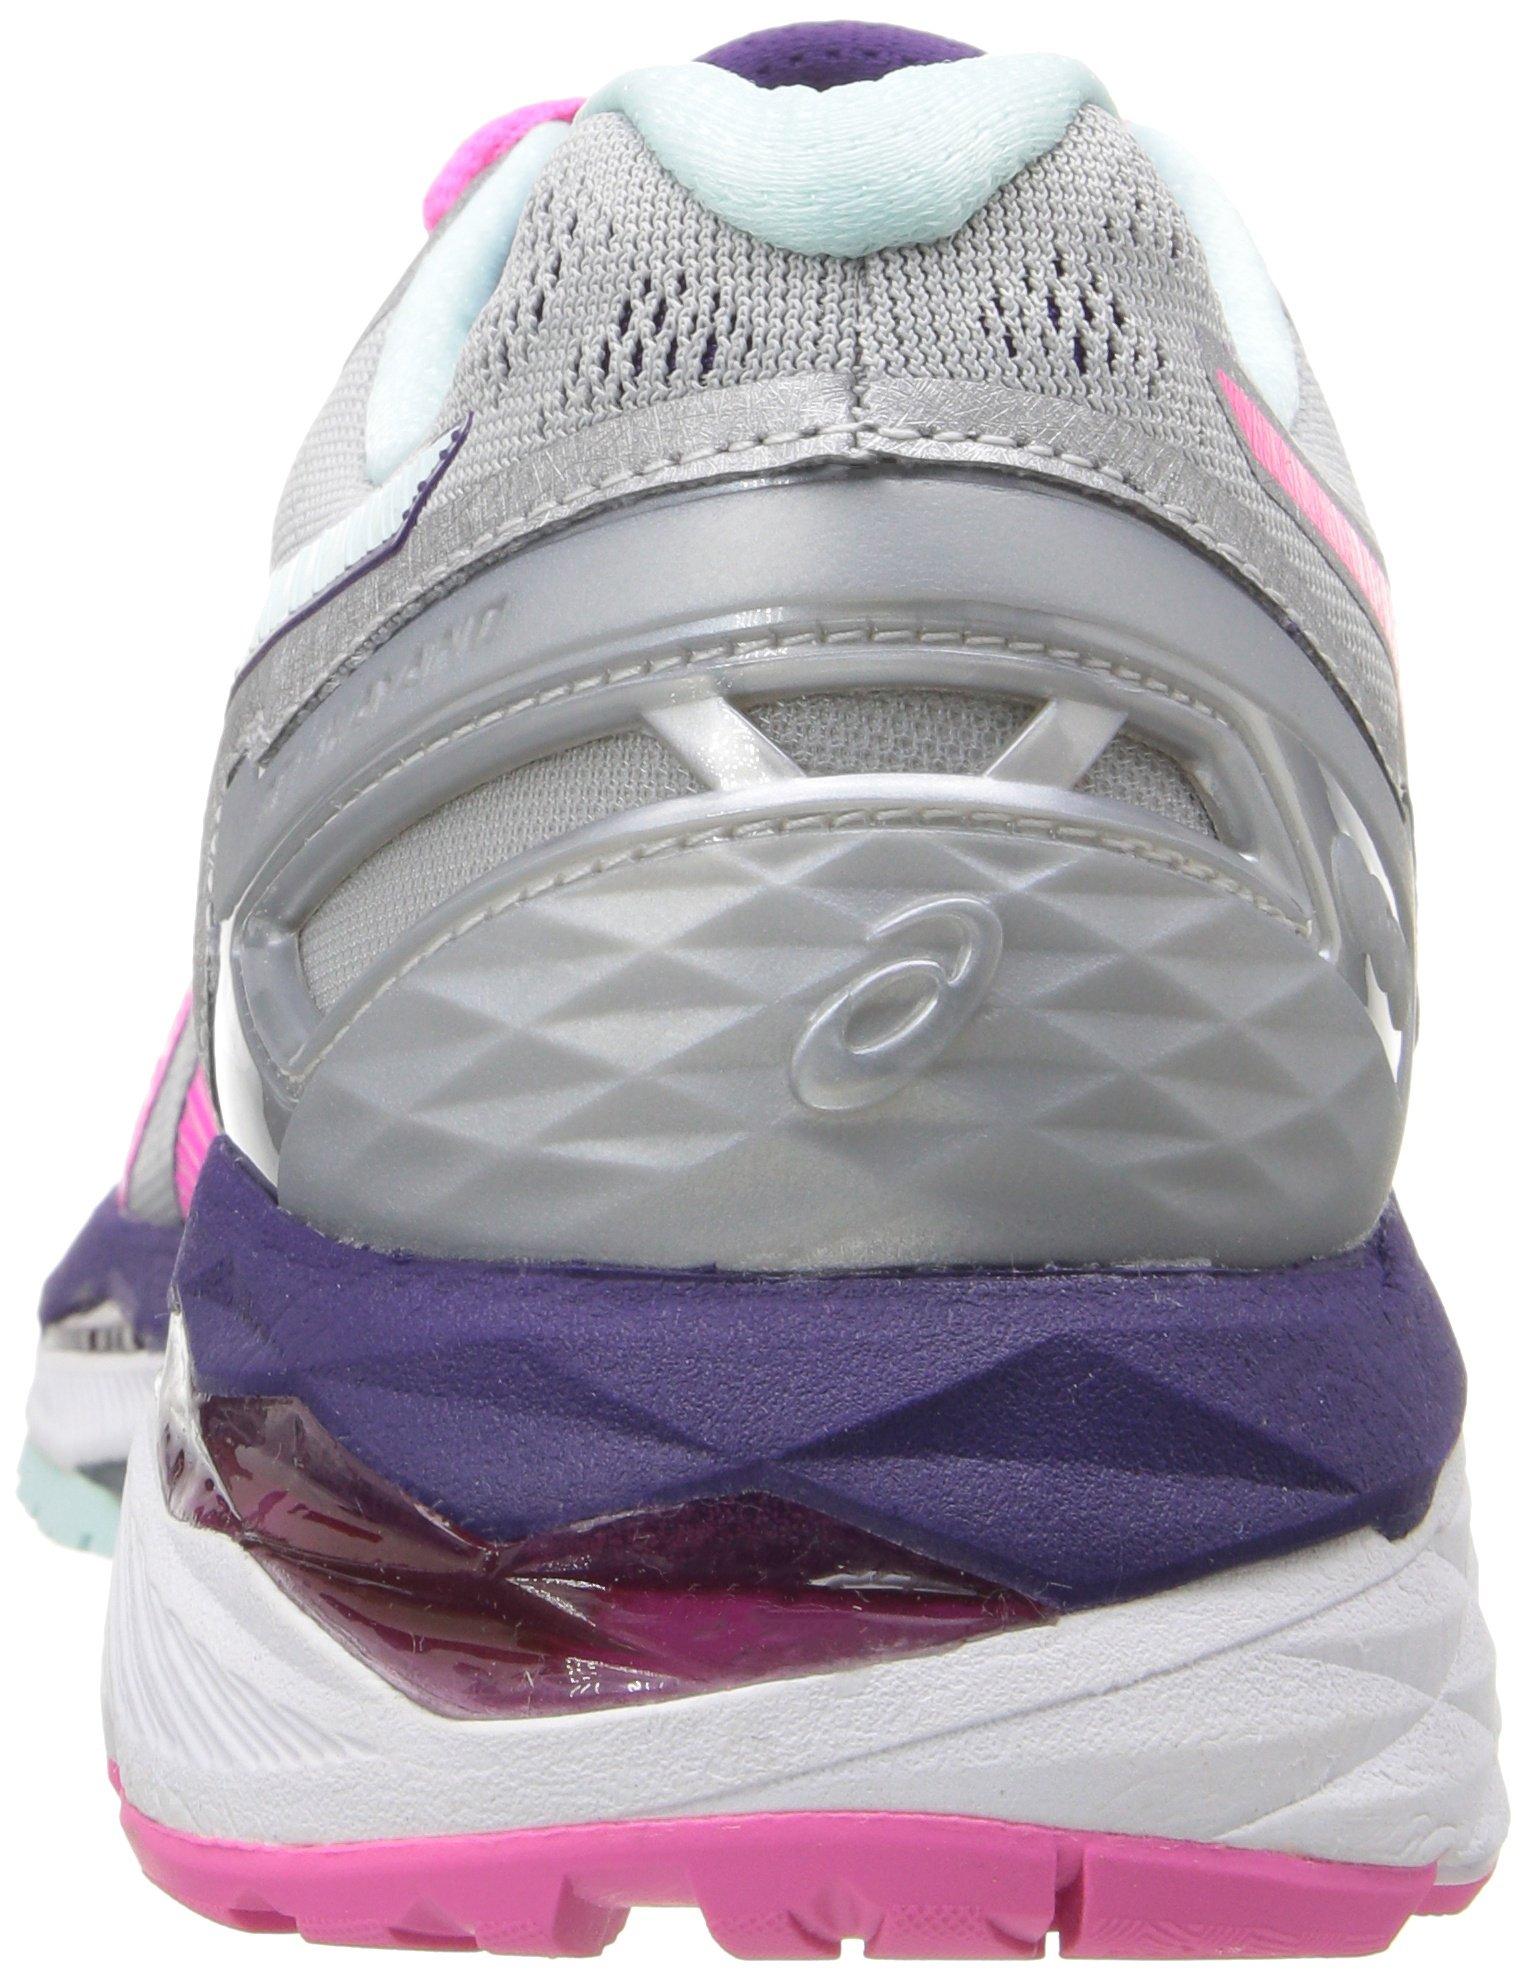 81C5ka5ZgRL - ASICS Women's Gel-Kayano 23 Running Shoe, Silver/Pink Glow/Parachute Purple, 5.5 UK